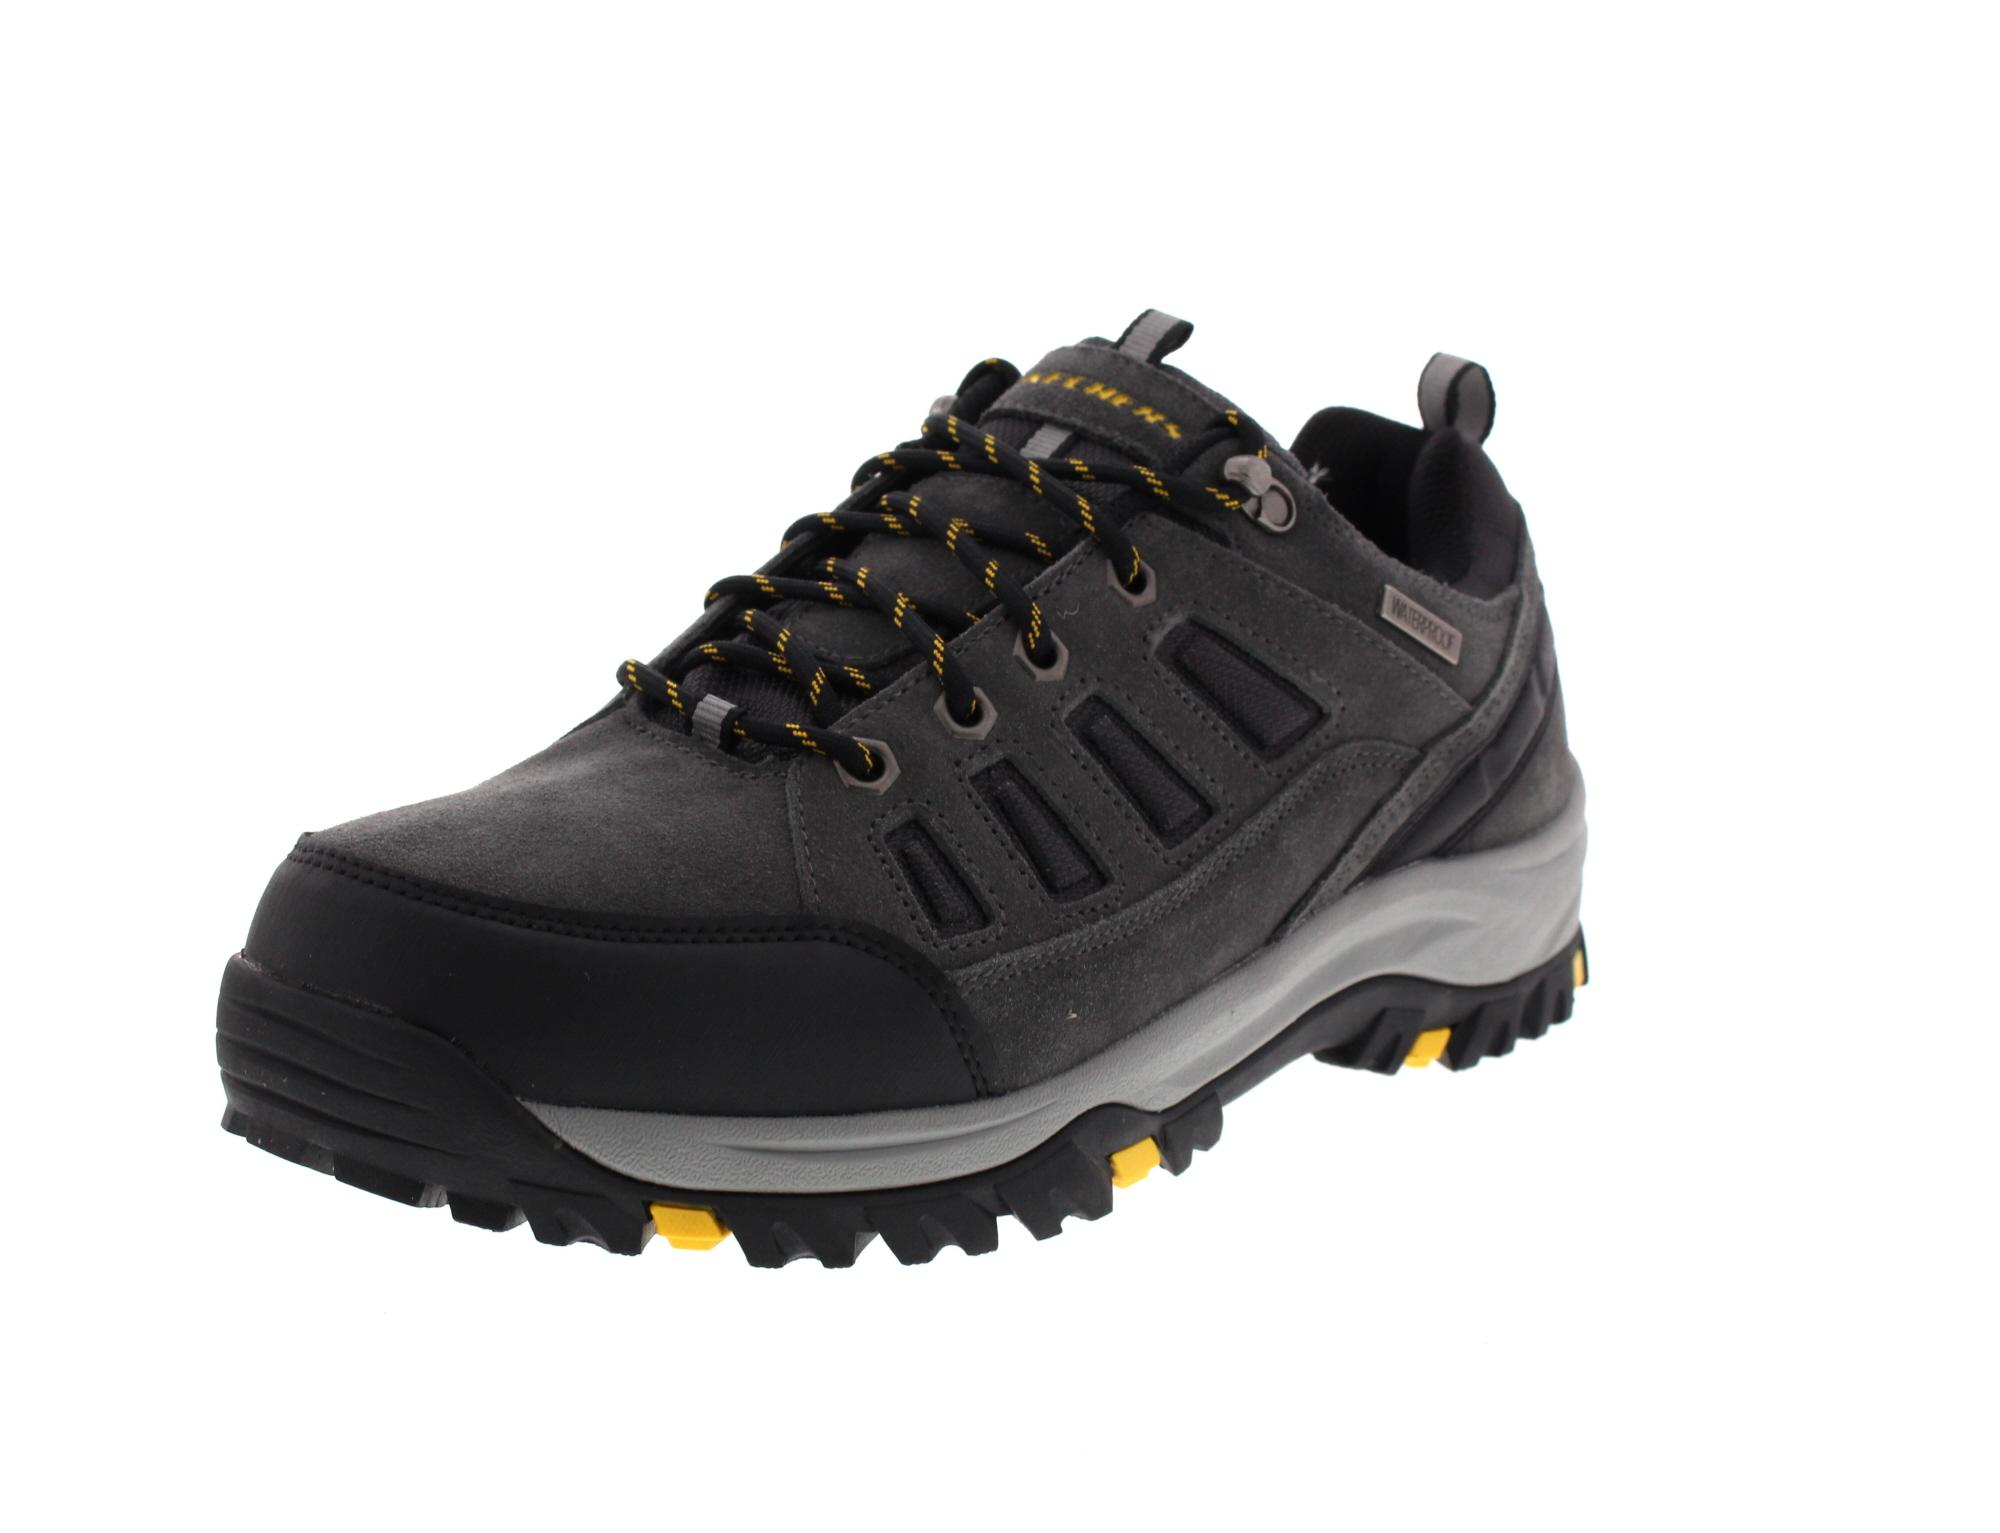 SKECHERS Sneakers in Übergröße RELMENT SONGEO 65673 GRY